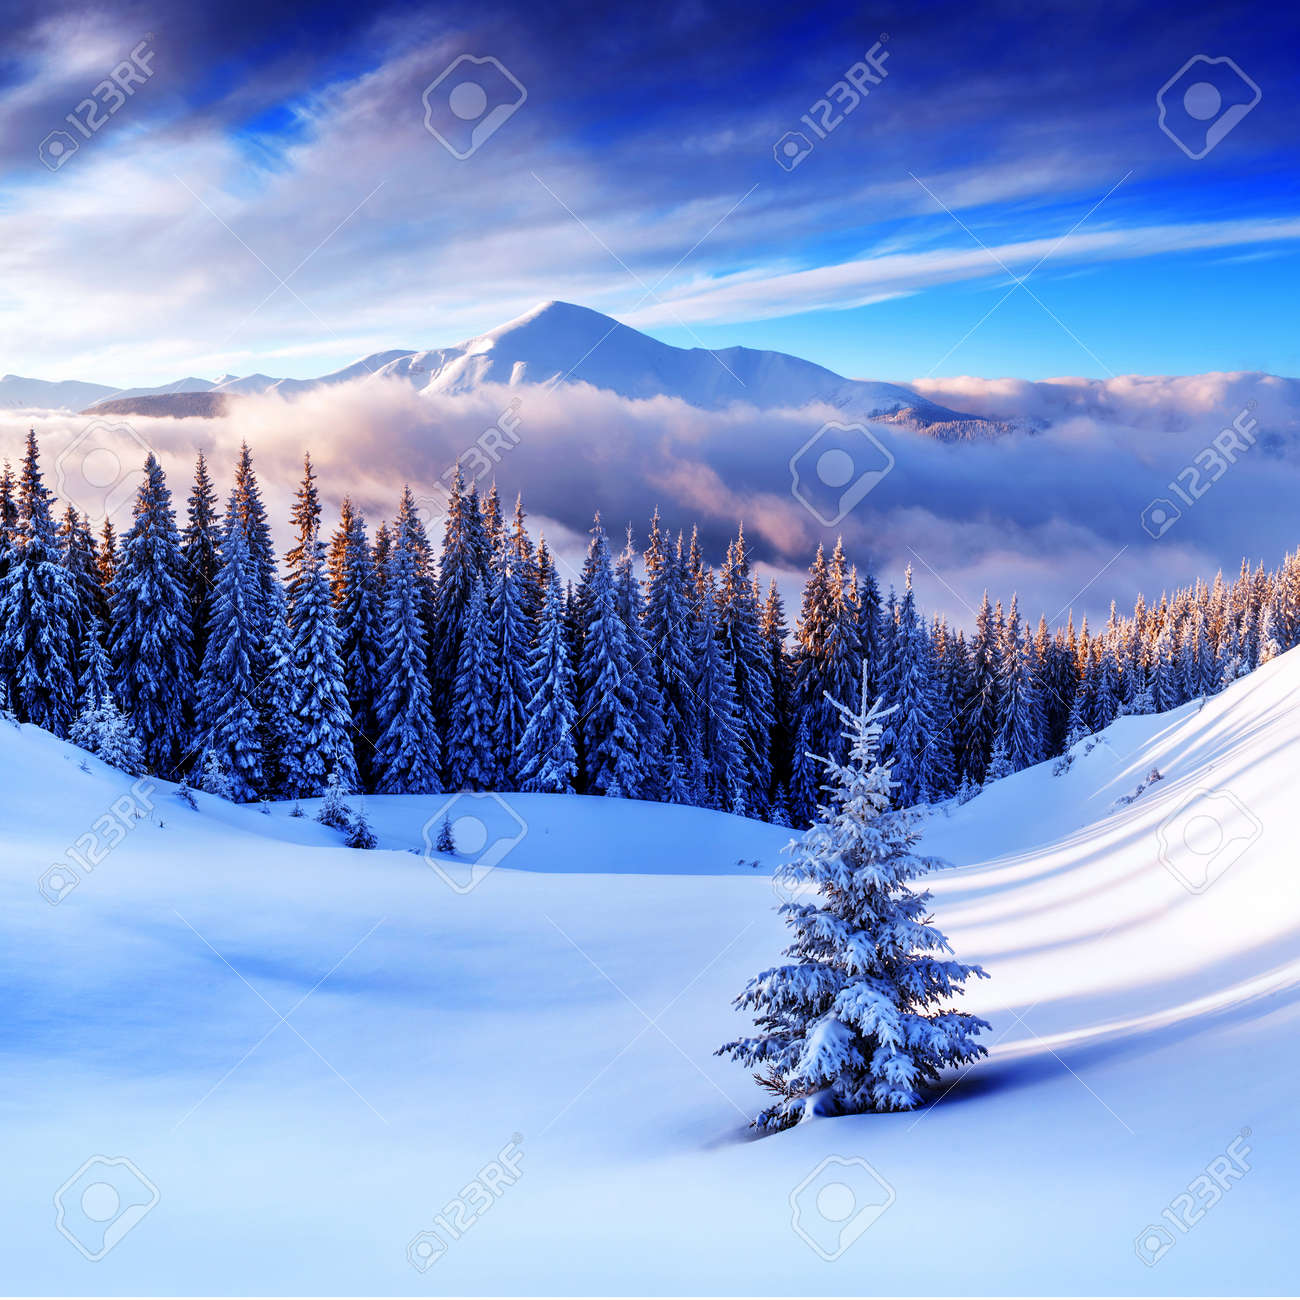 snovy trees on winter mountains - 33008591